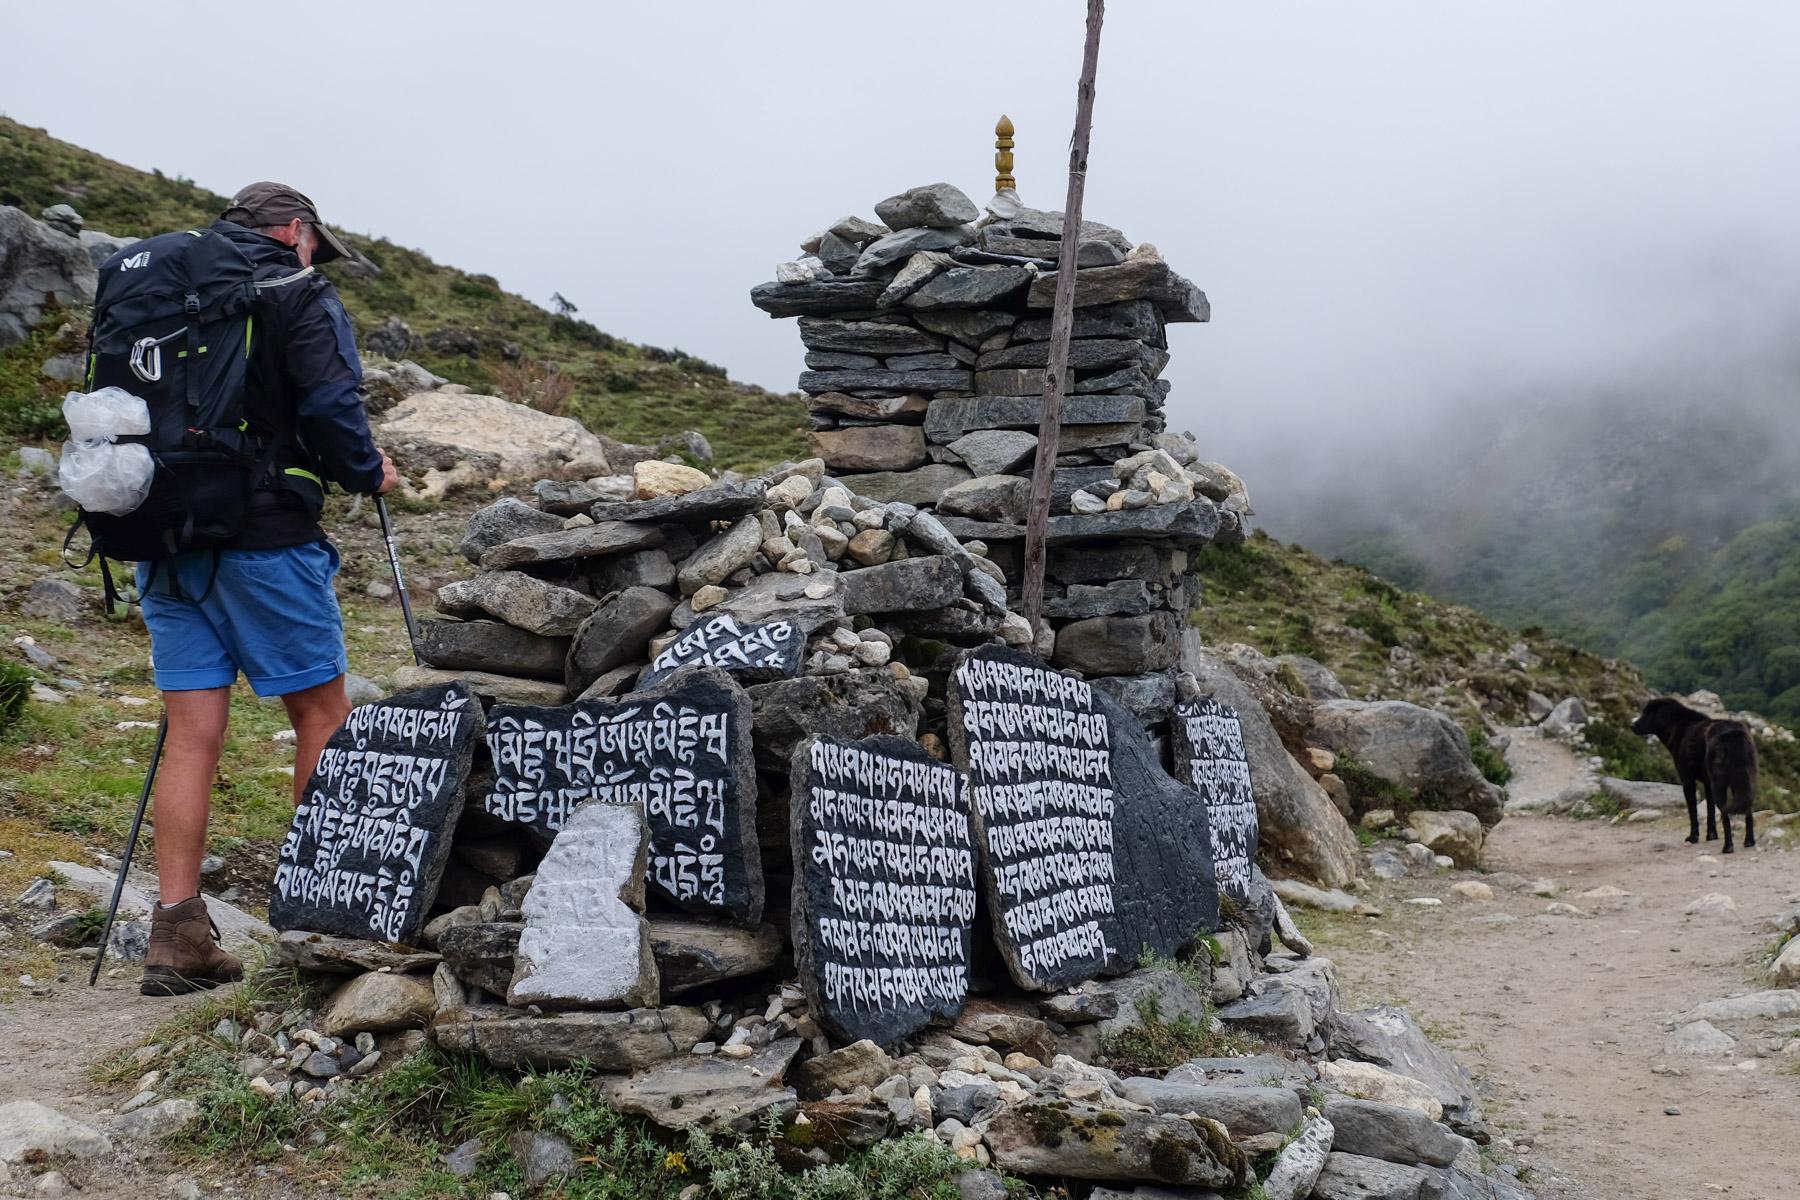 Everest Base Camp, Everest 3 pass #2 16